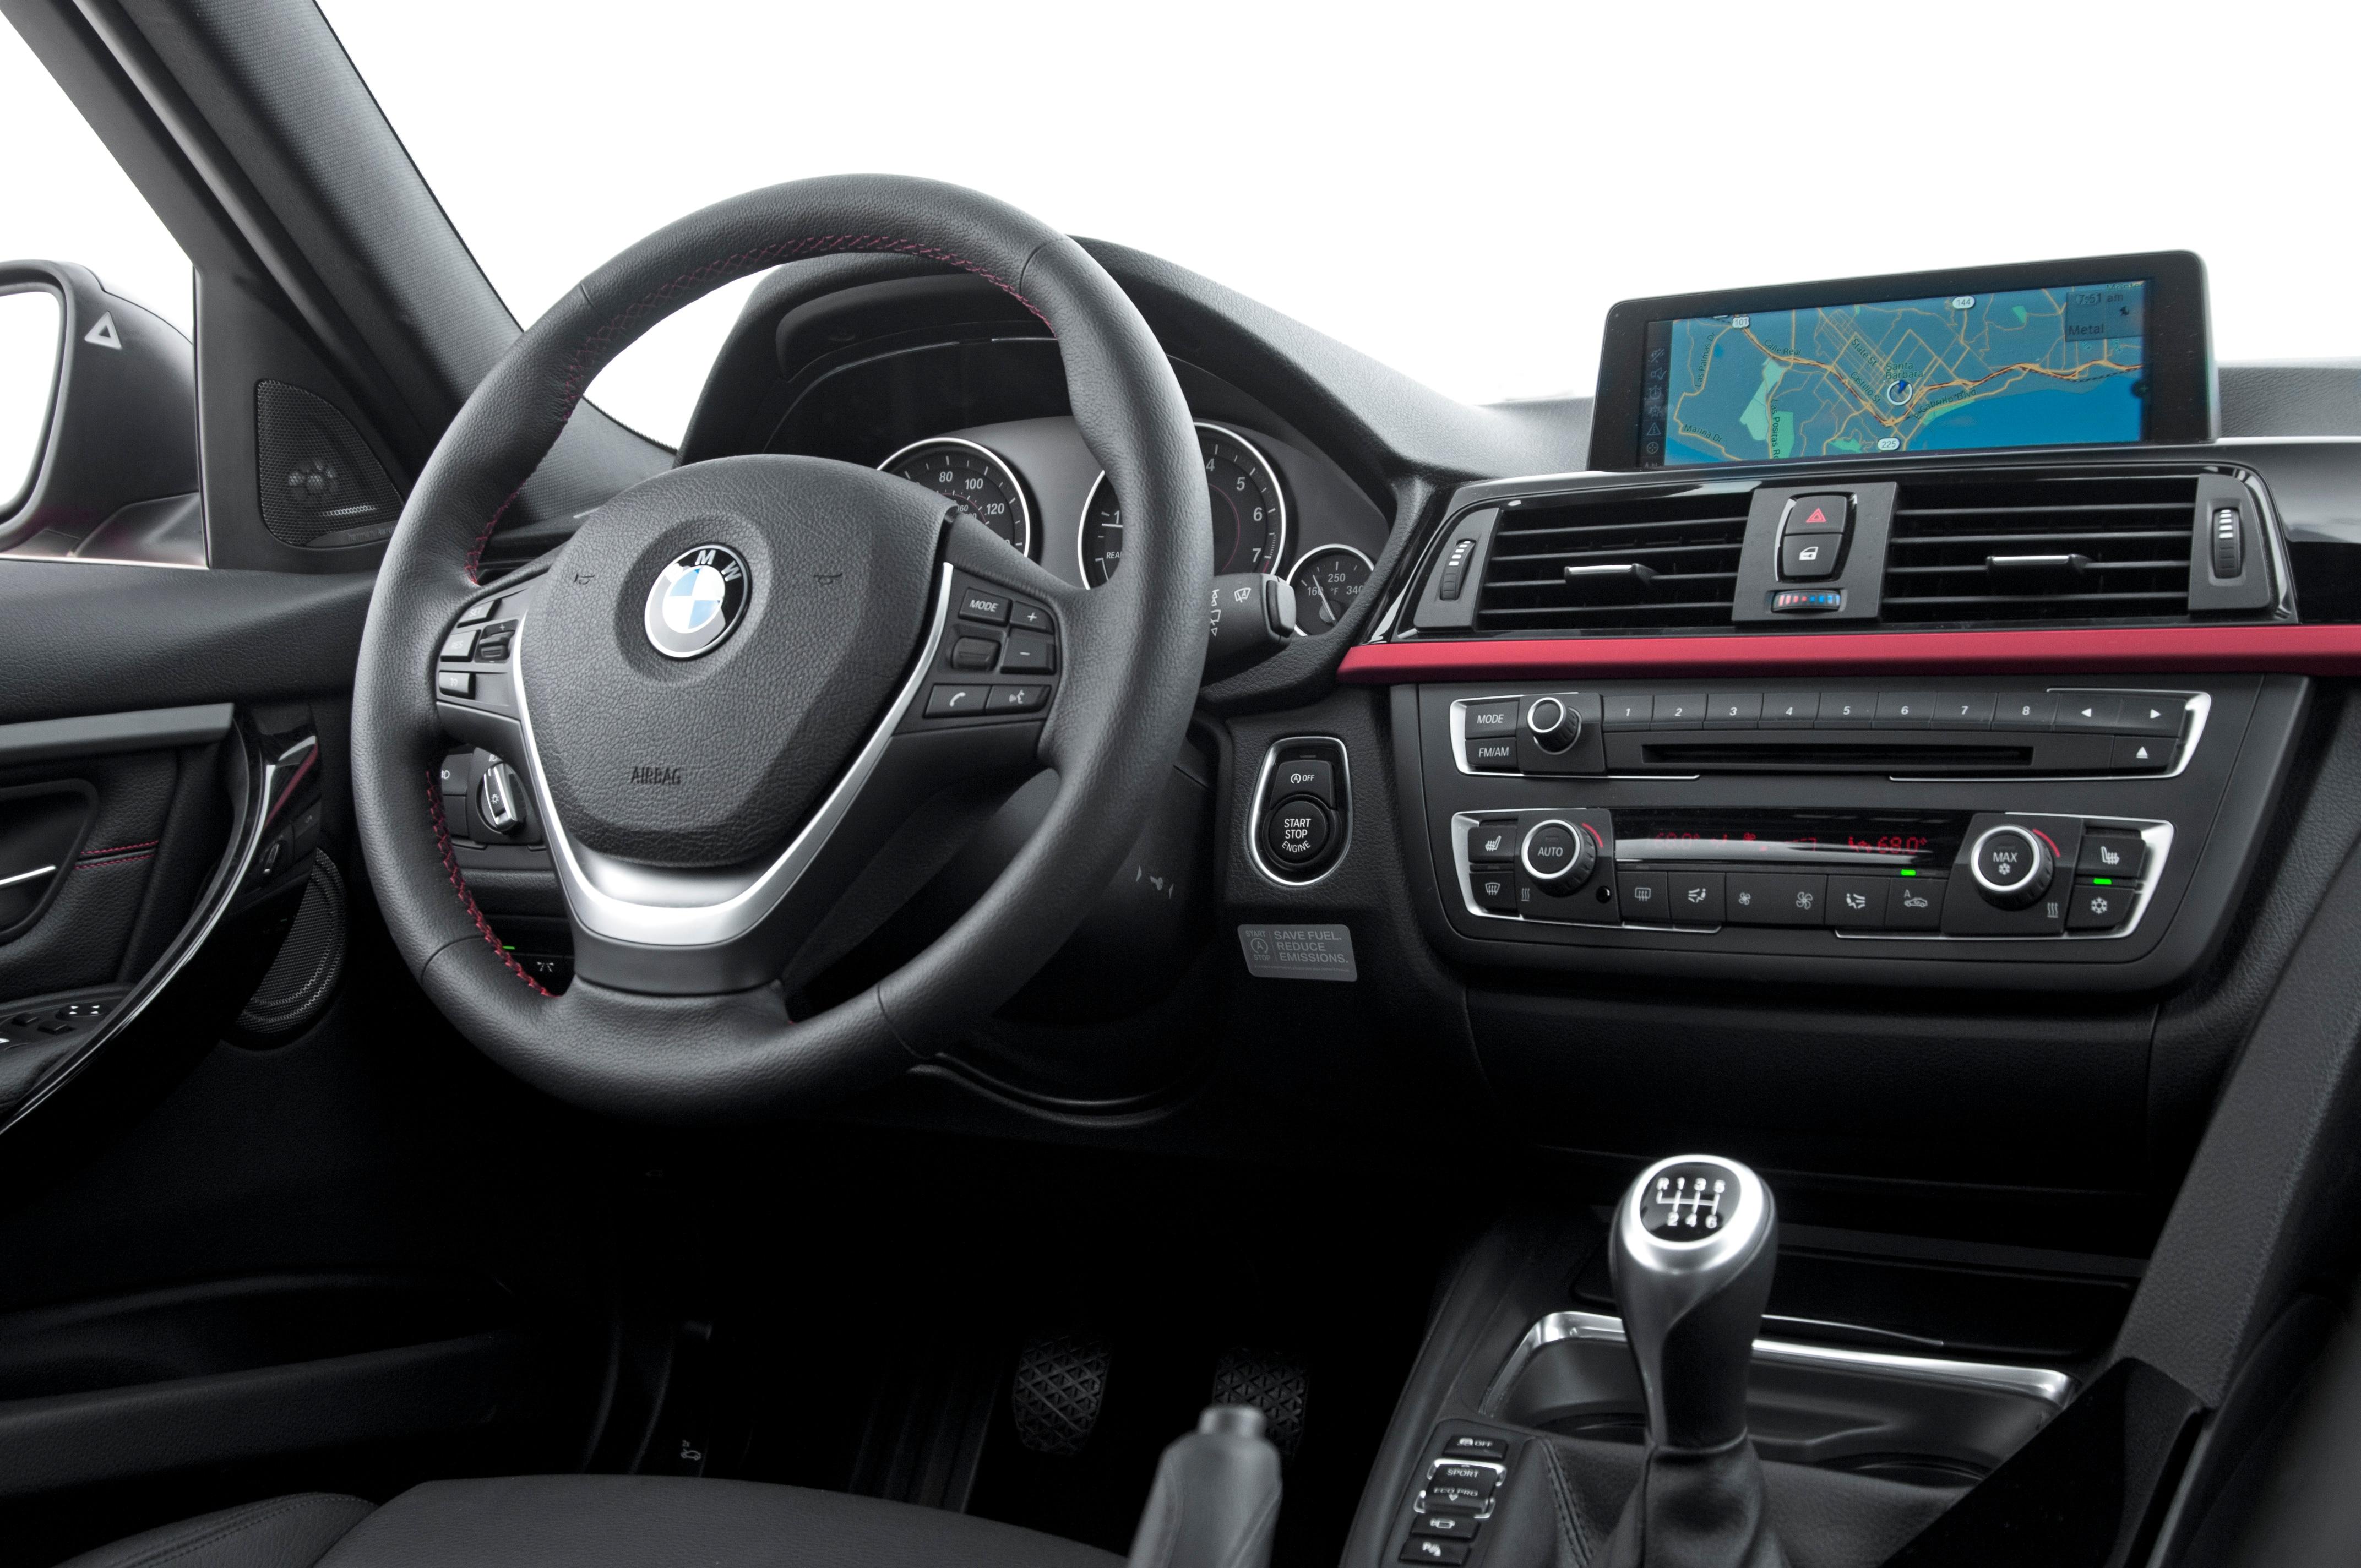 First Drive: 2012 BMW 335i - Automobile Magazine